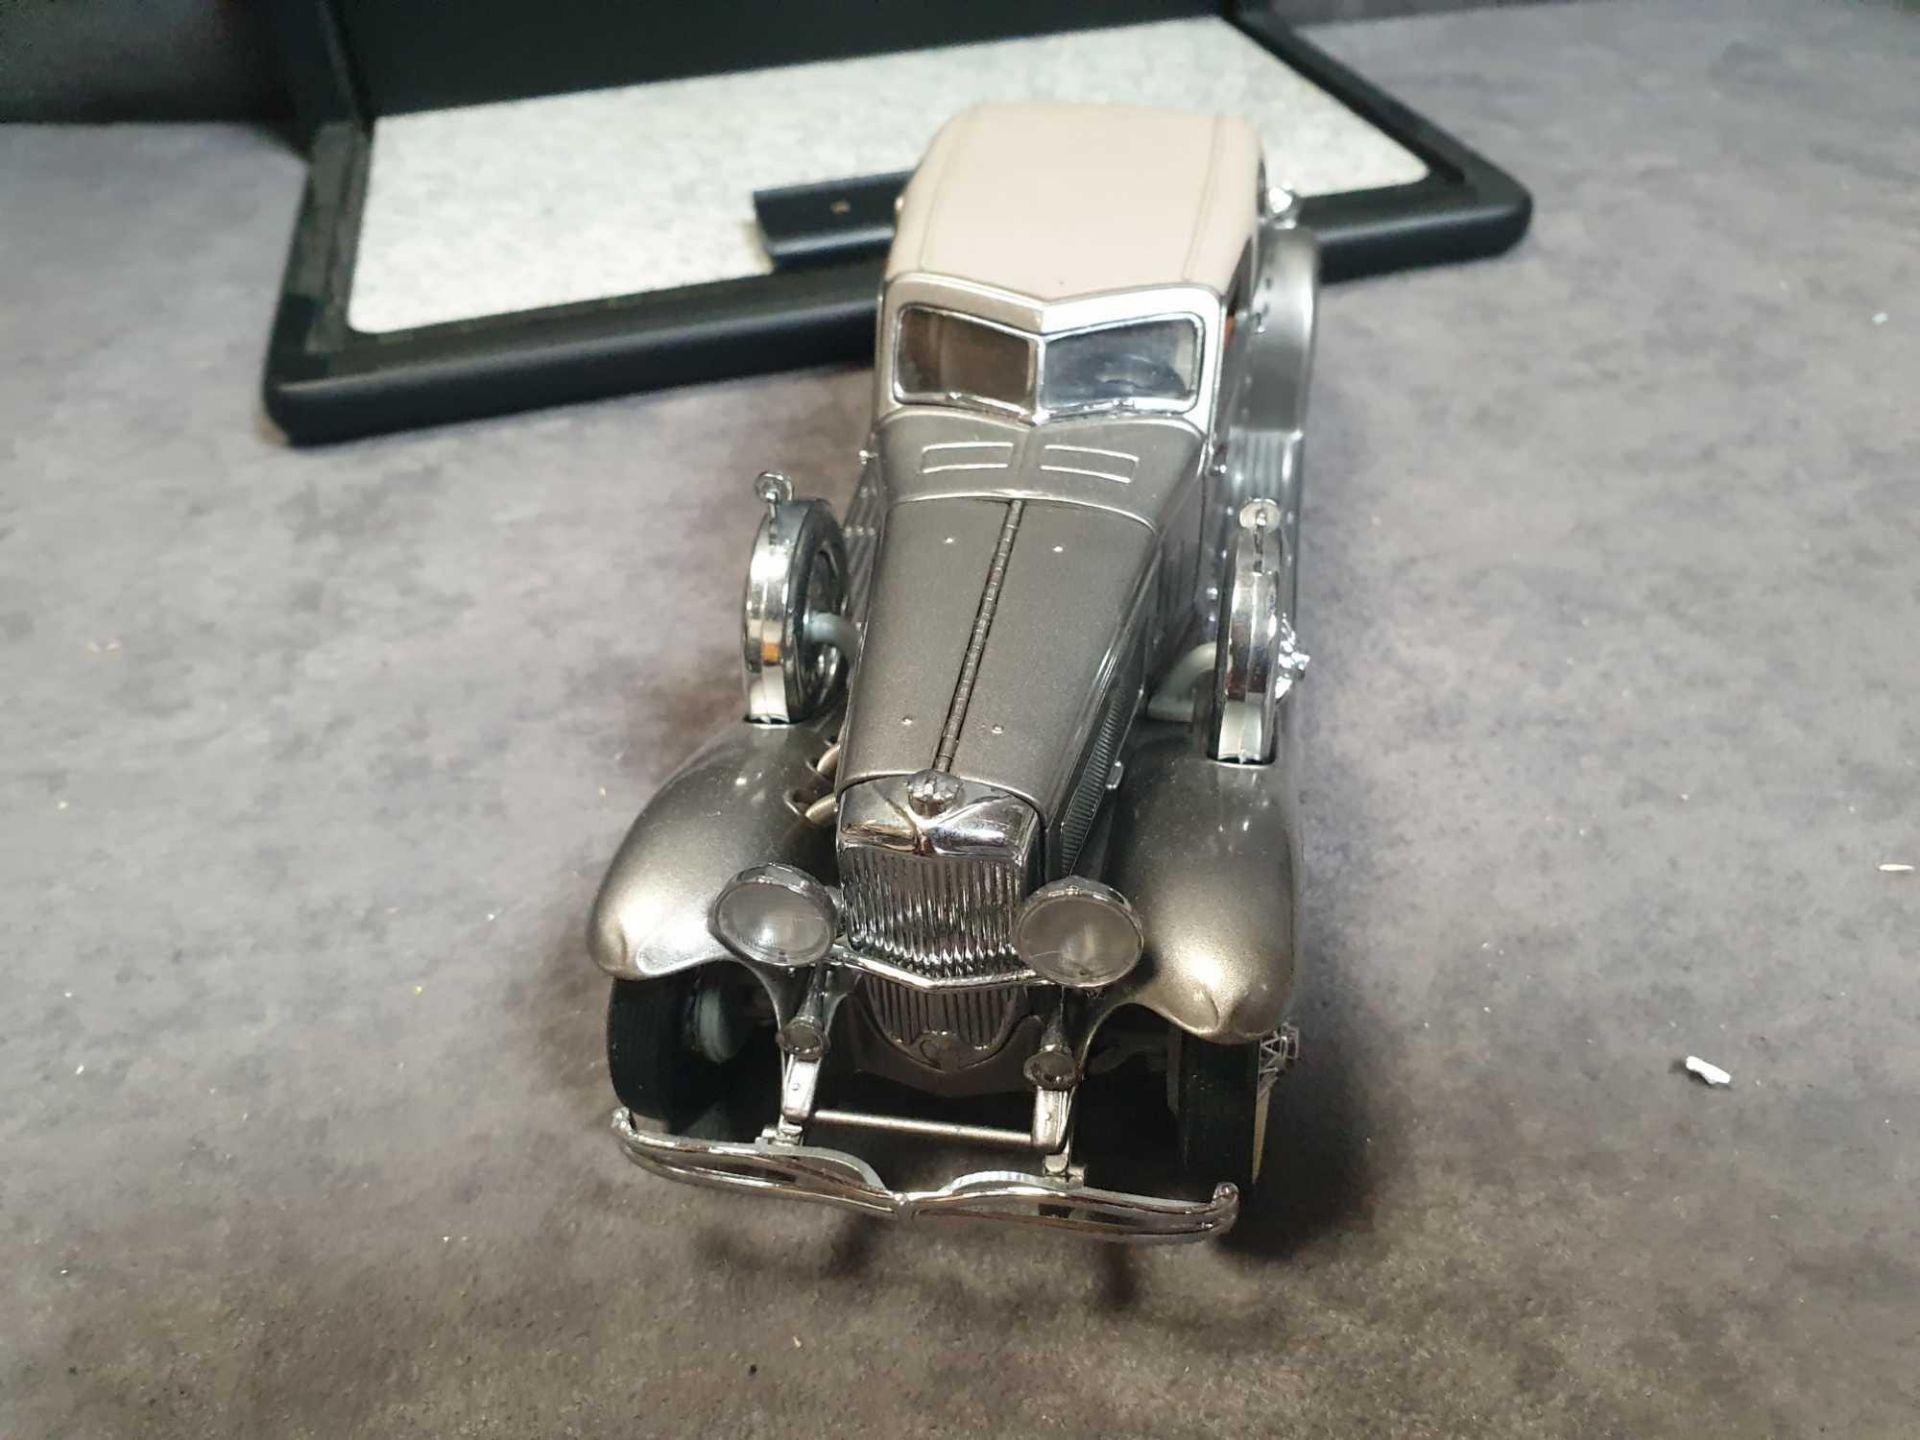 Franklin Mint 1933 Dussenberg SJ Twenty Grand Diecast Model Car Mint Model - Image 3 of 3